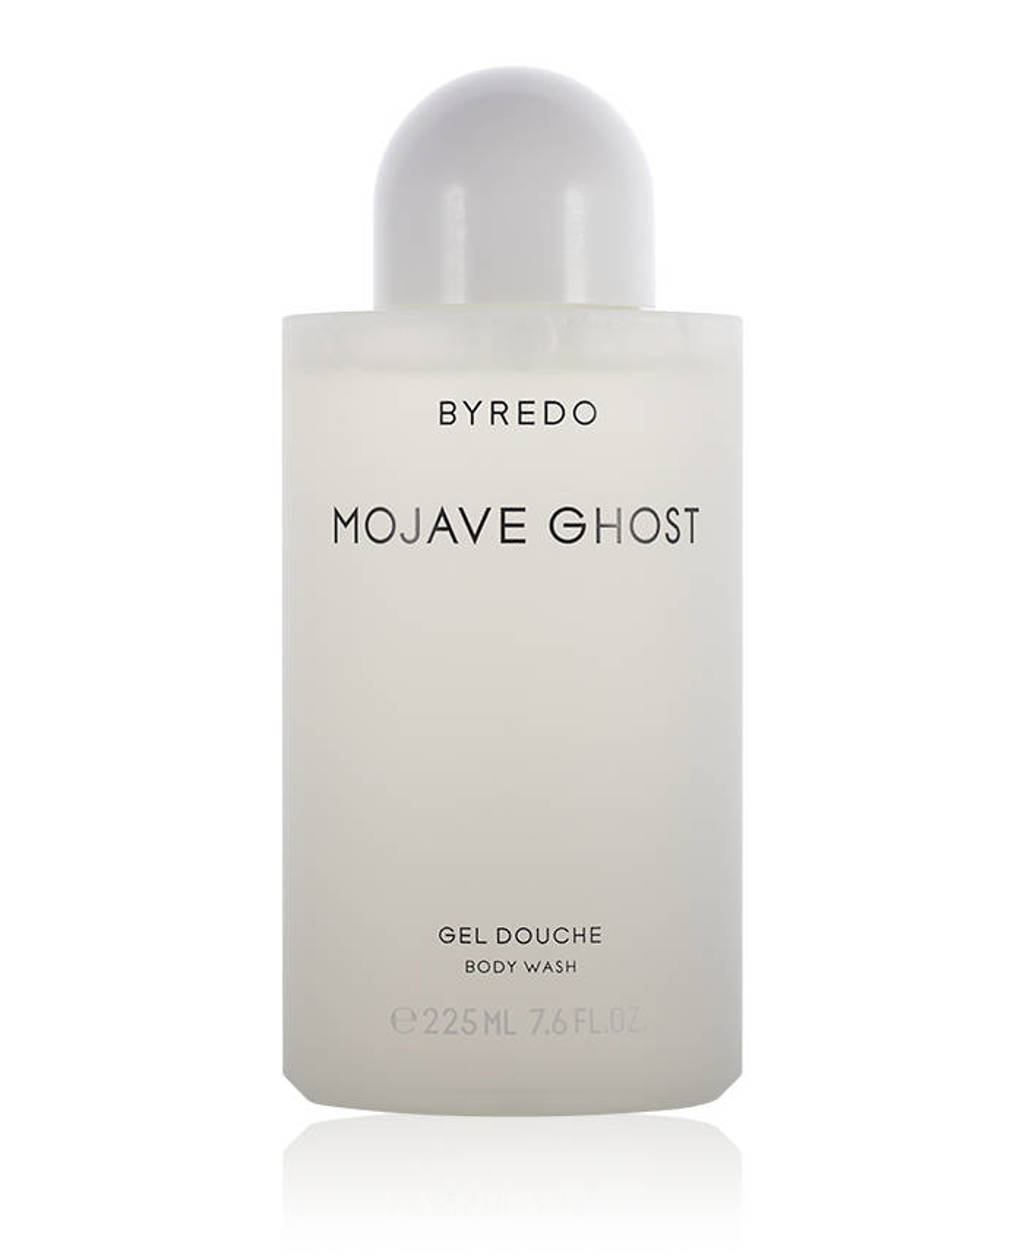 Byredo Mojave Ghost douchegel